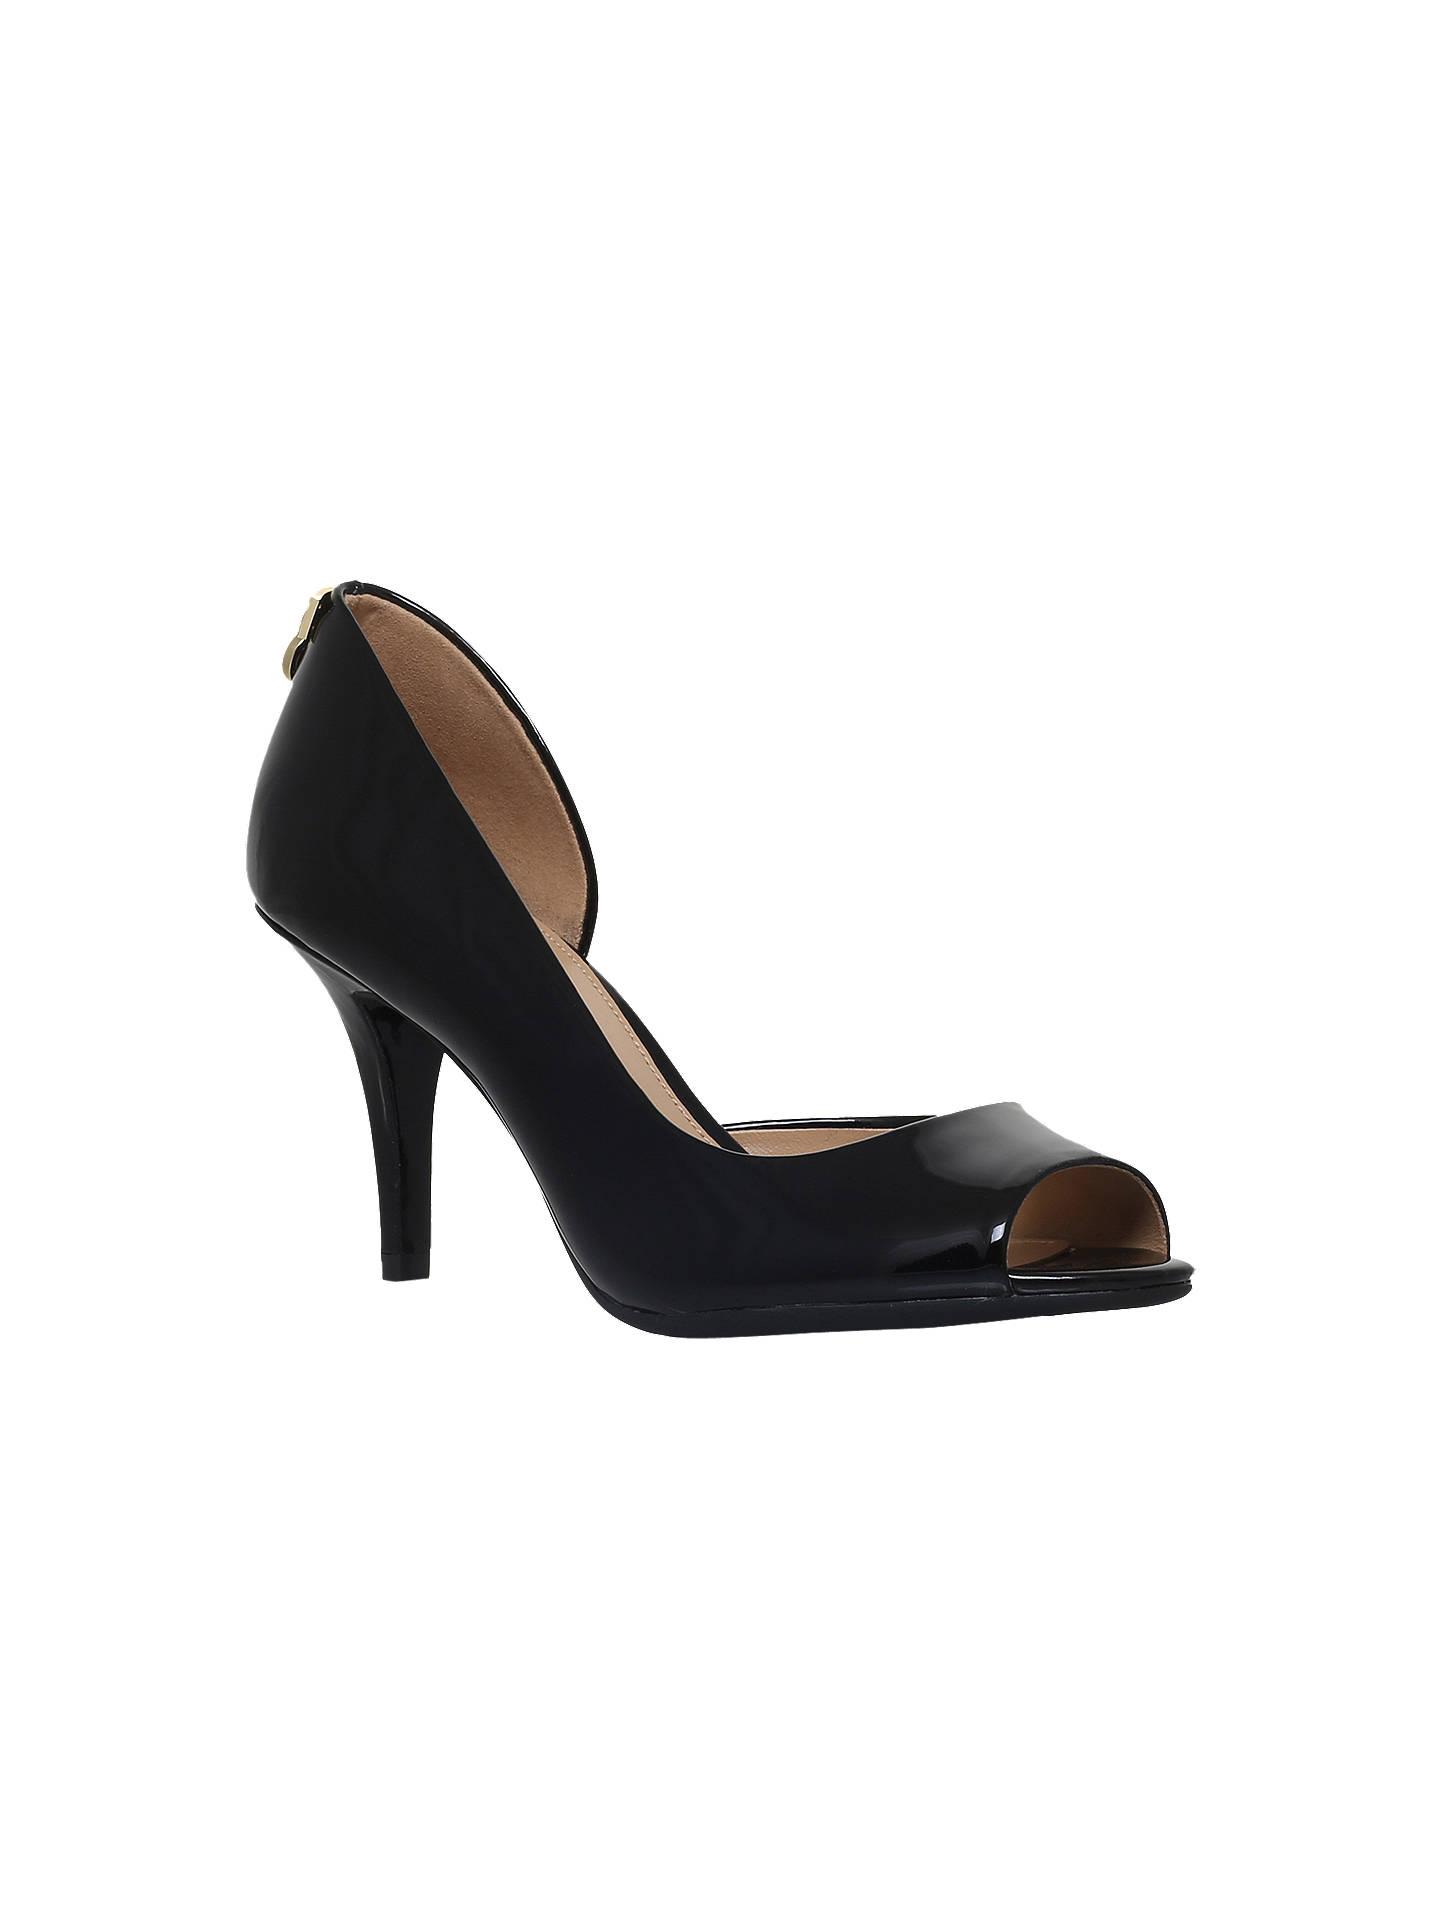 9e744de88b71 MICHAEL Michael Kors Hamilton Peep Toe Asymmetric Sandals at John ...